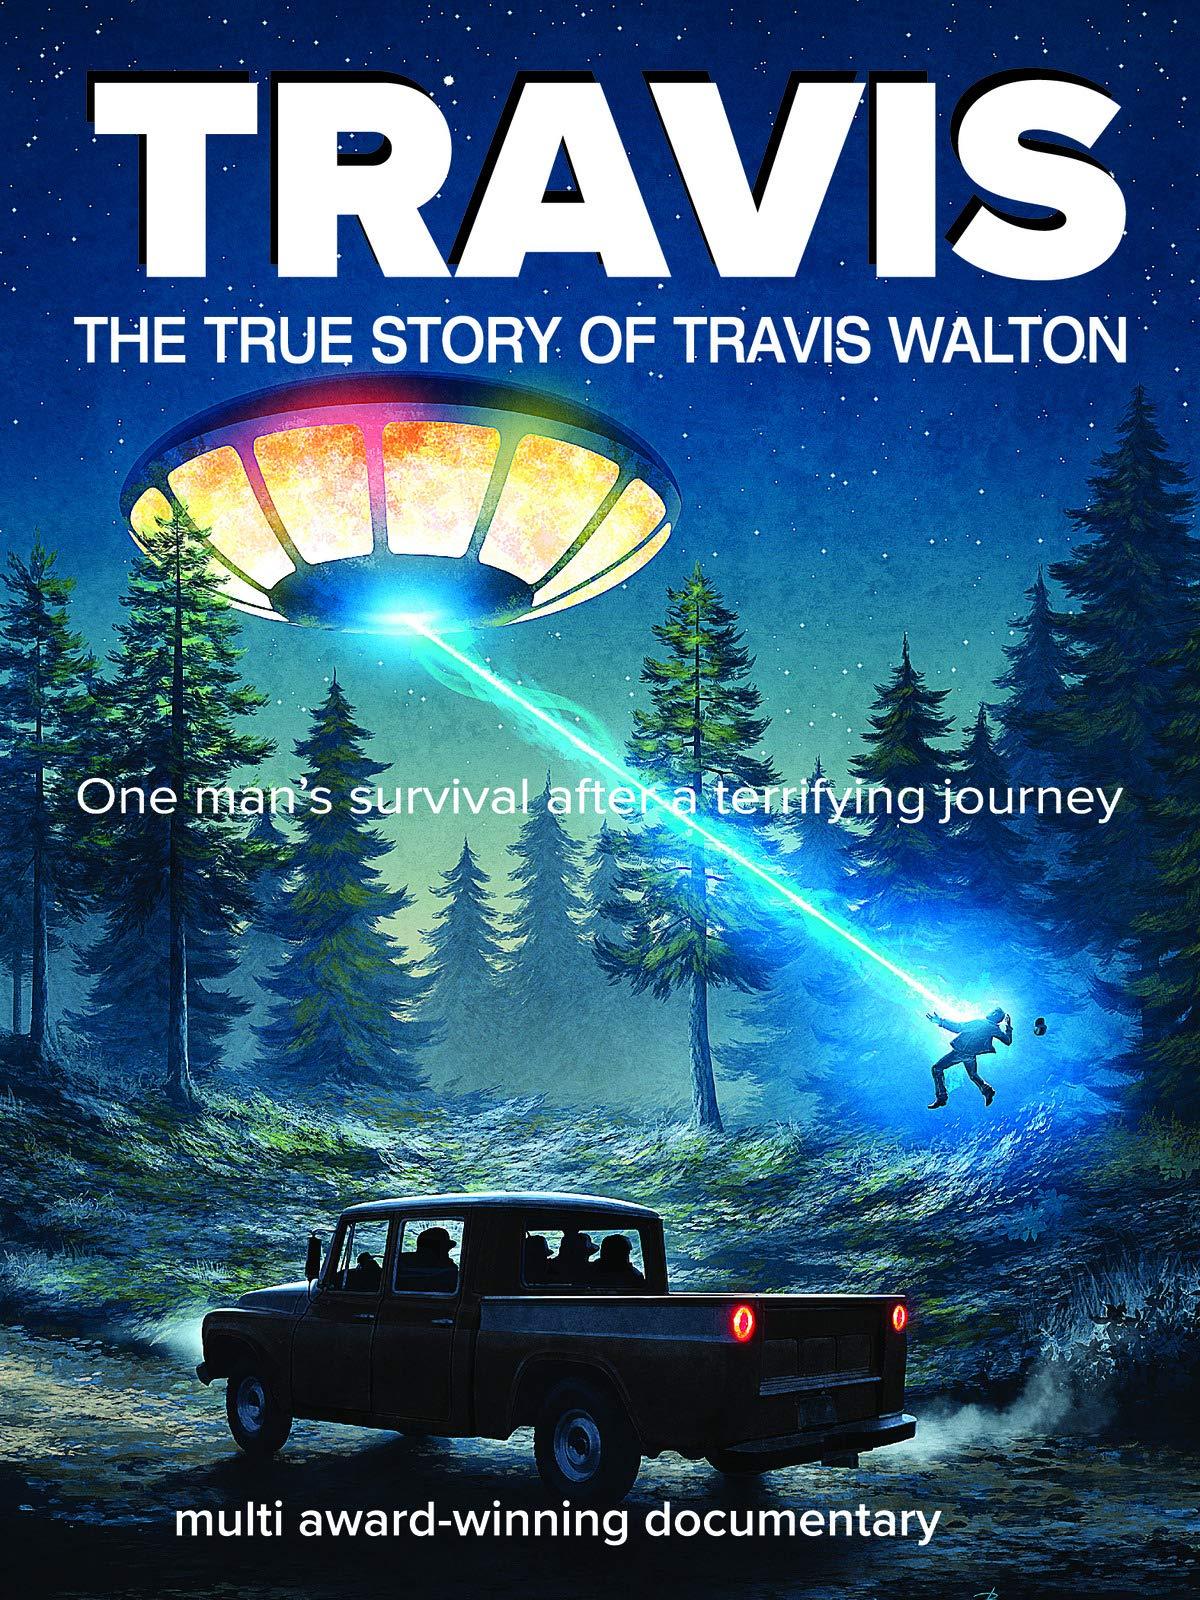 Travis - The True Story Of Travis Walton on Amazon Prime Video UK